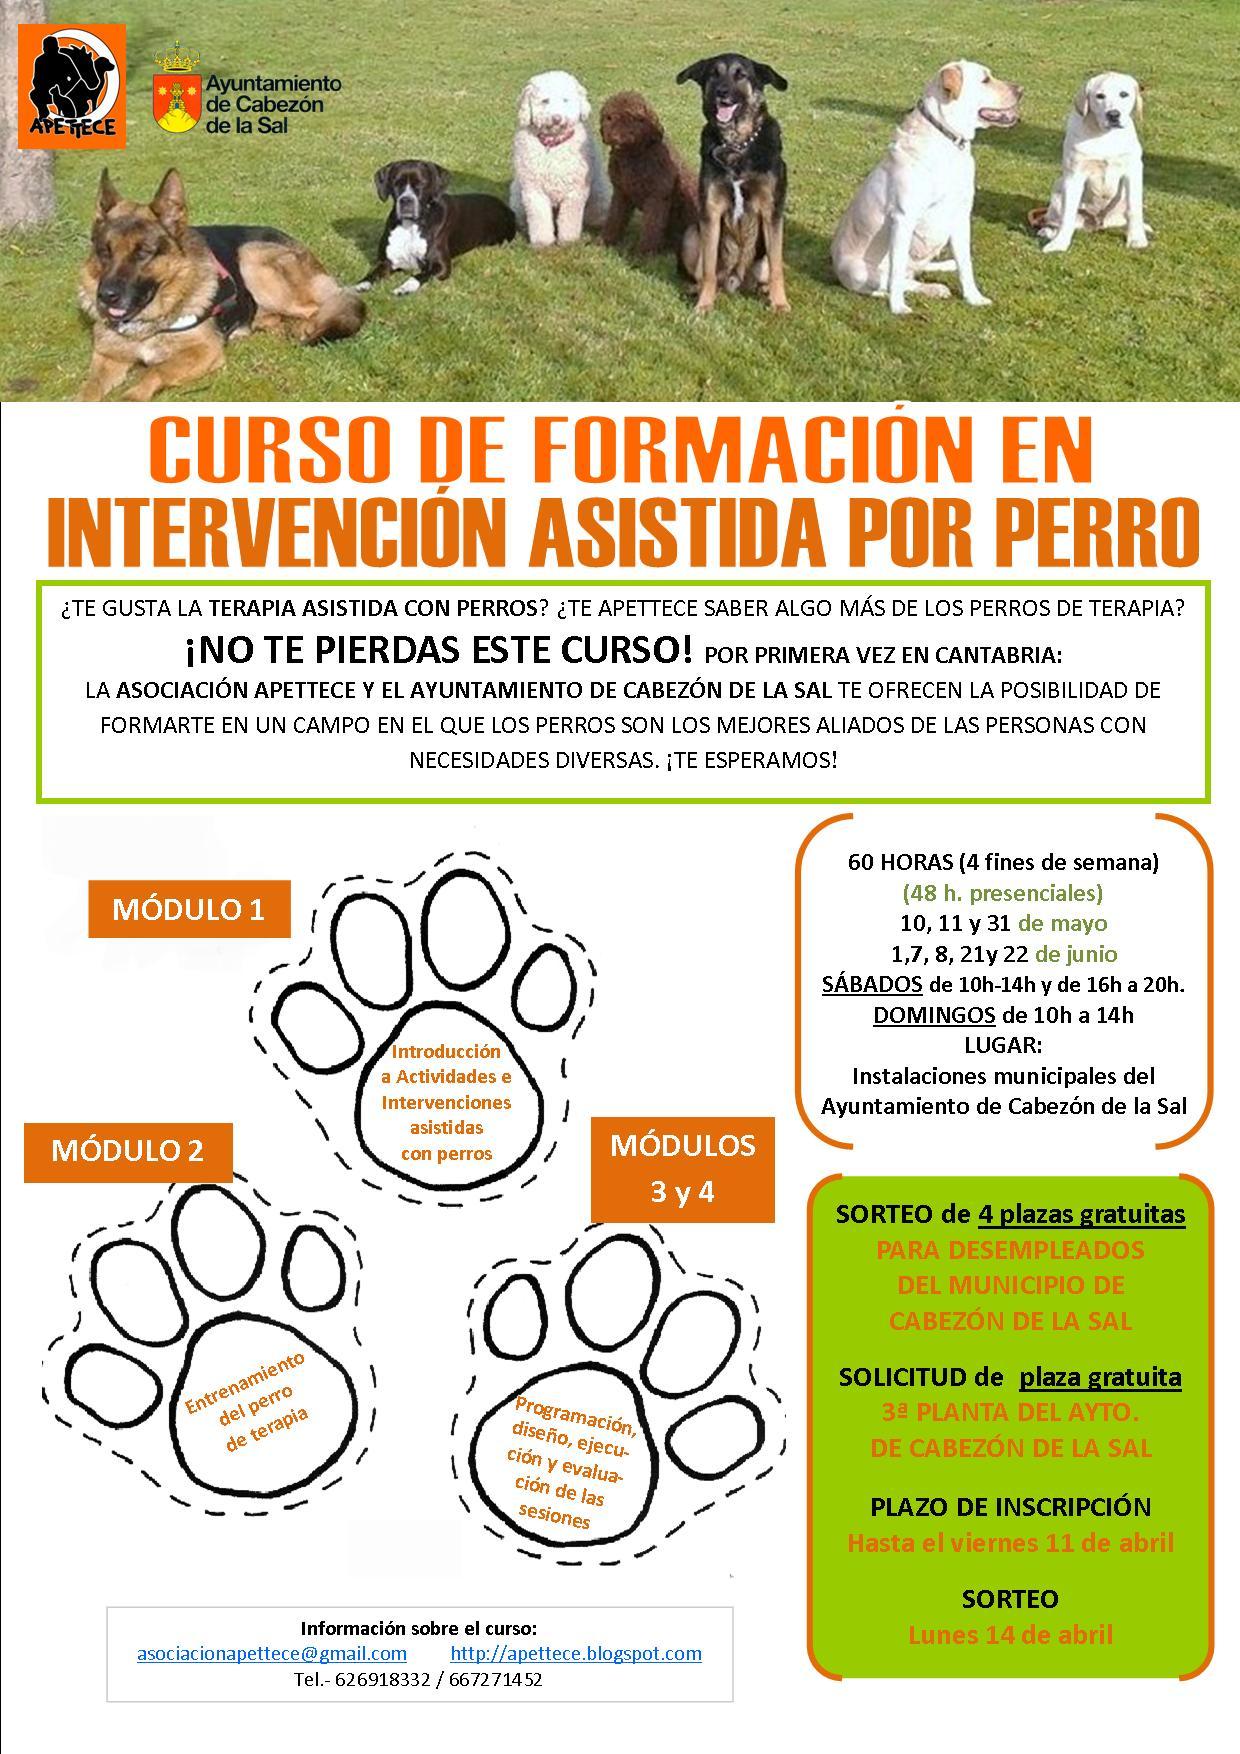 http://www.cabezondelasal.net/wp-content/uploads/2014/03/curso-intervenci%C3%B3n-asistida-por-perro.jpg